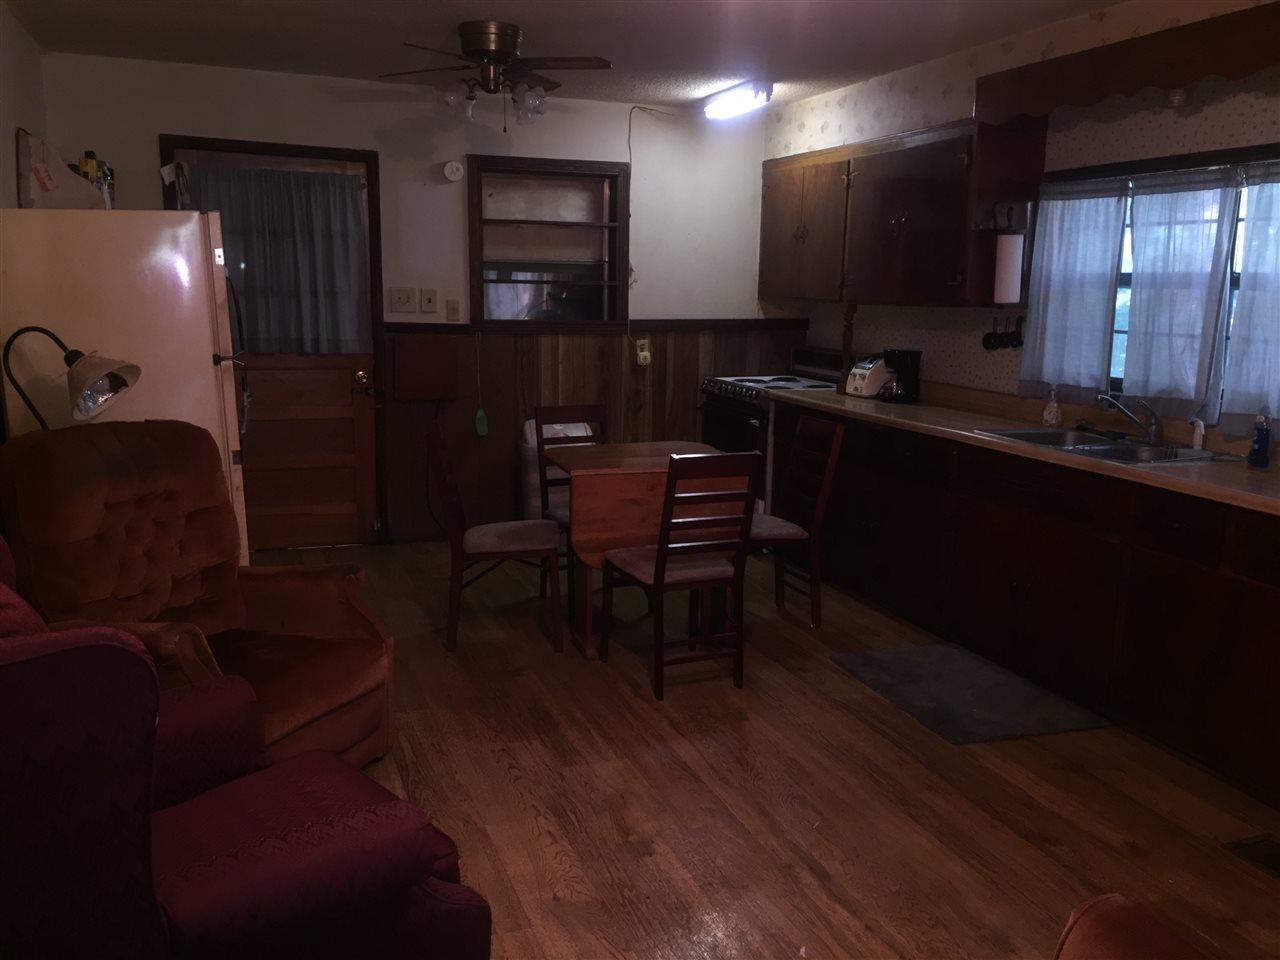 6546 Old Tipton Millington, TN 38053 - MLS #: 10008584